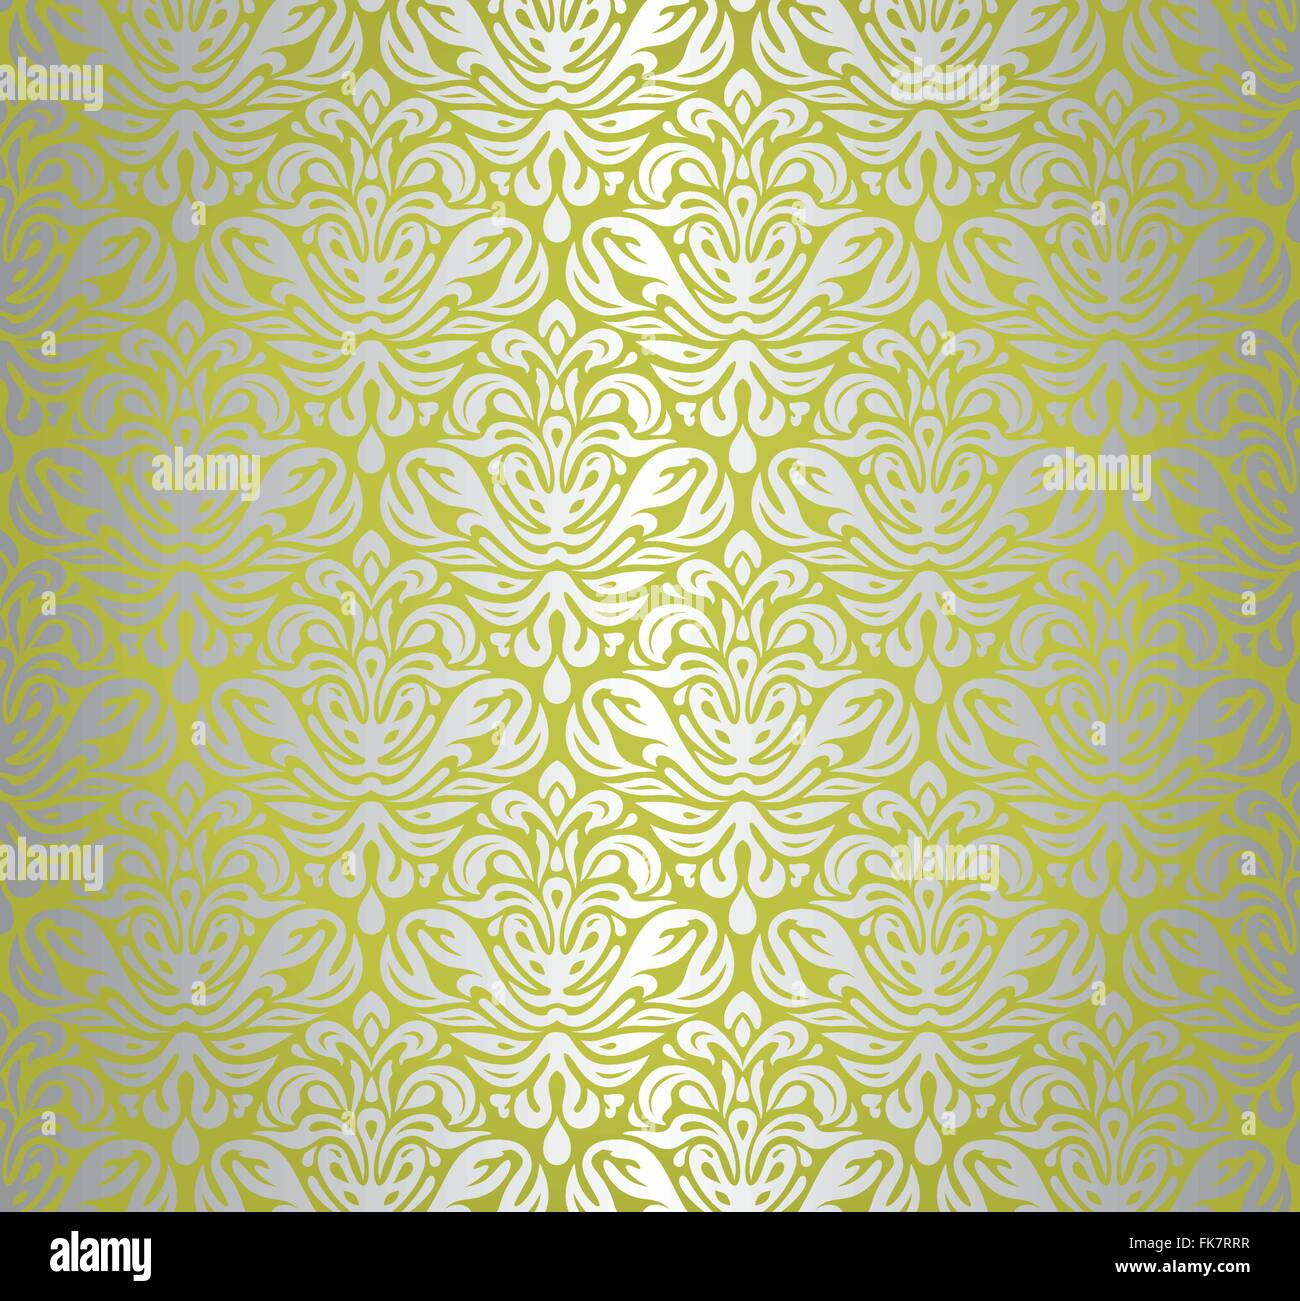 Green & silver shining pattern decorative holiday vintage wallpaper ...